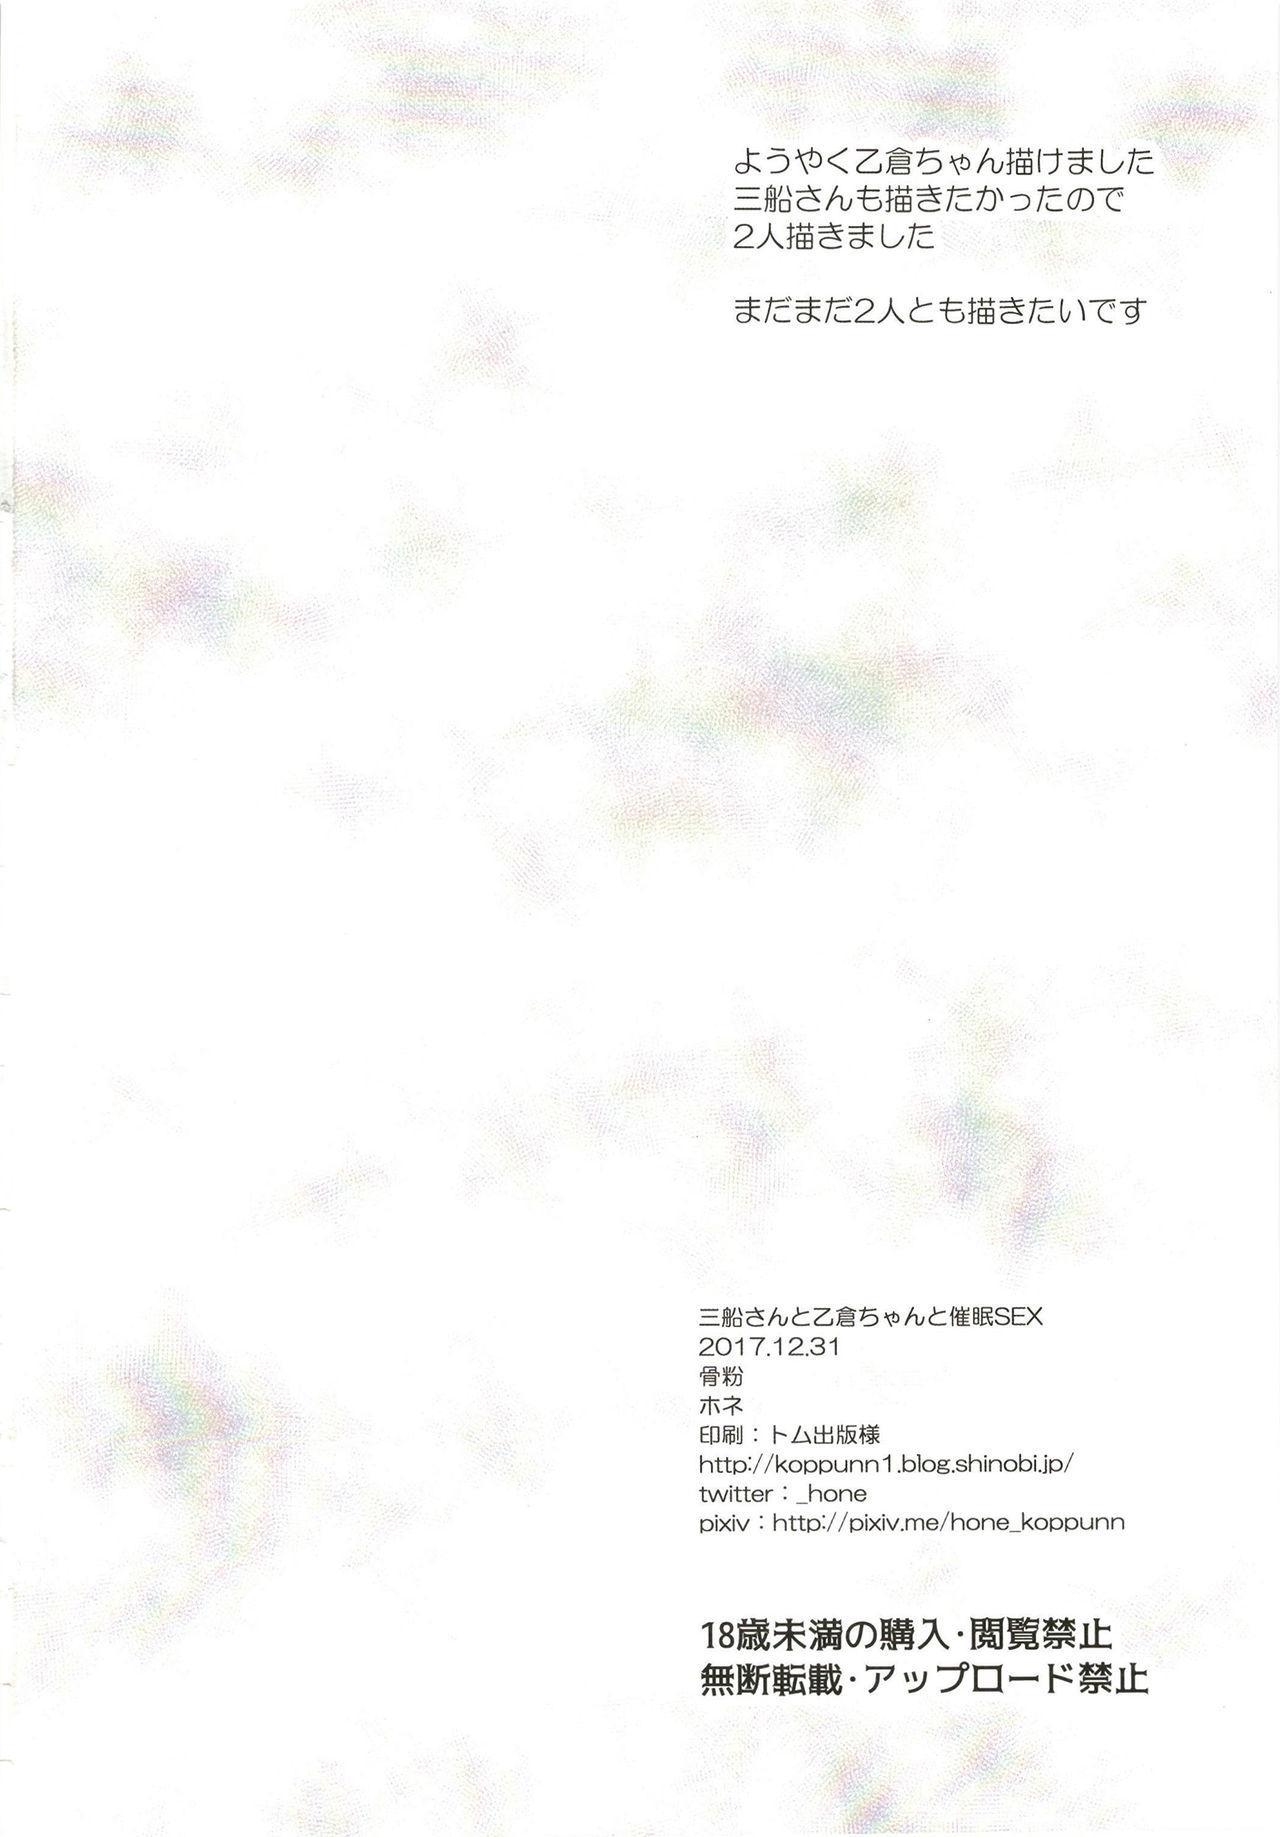 [Koppun (Hone)] Mifune-san to Otokura-chan to Saimin Sex (THE IDOLM@STER CINDERELLA GIRLS) [Digital] 25